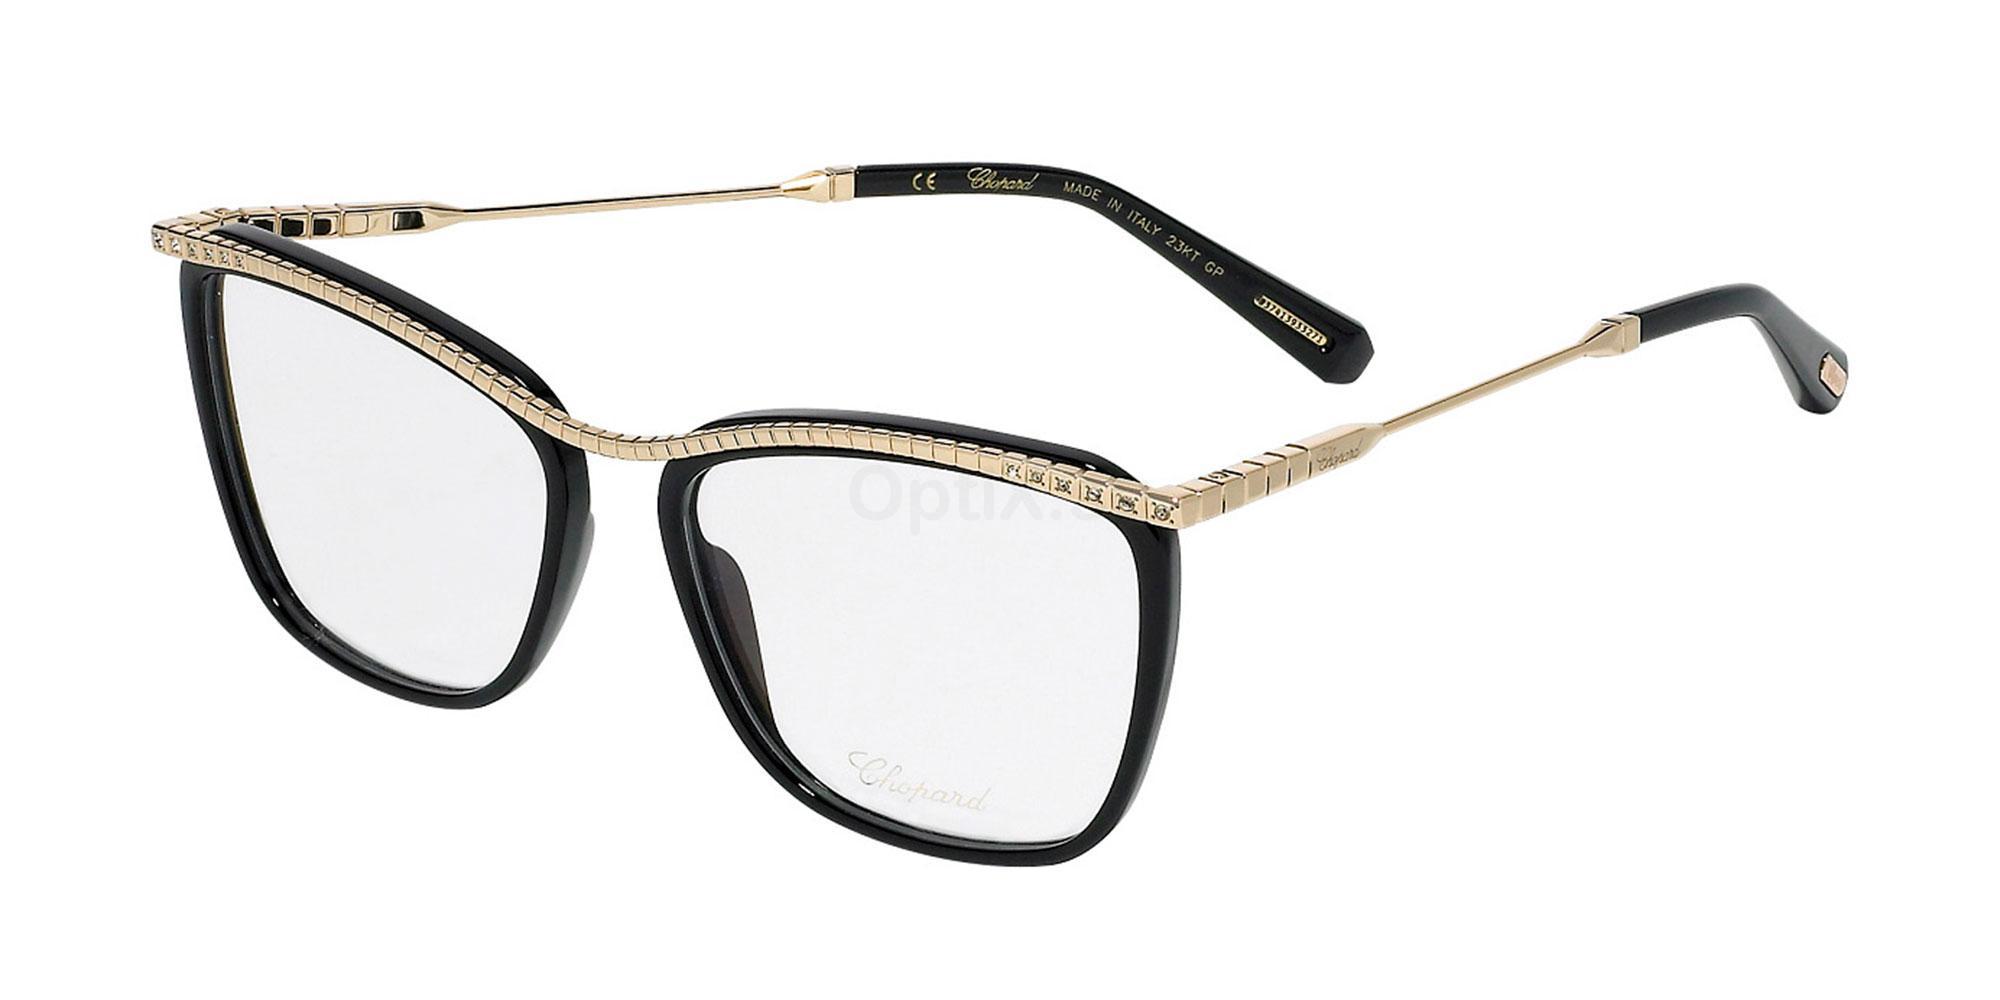 0700 VCHD16S Glasses, Chopard